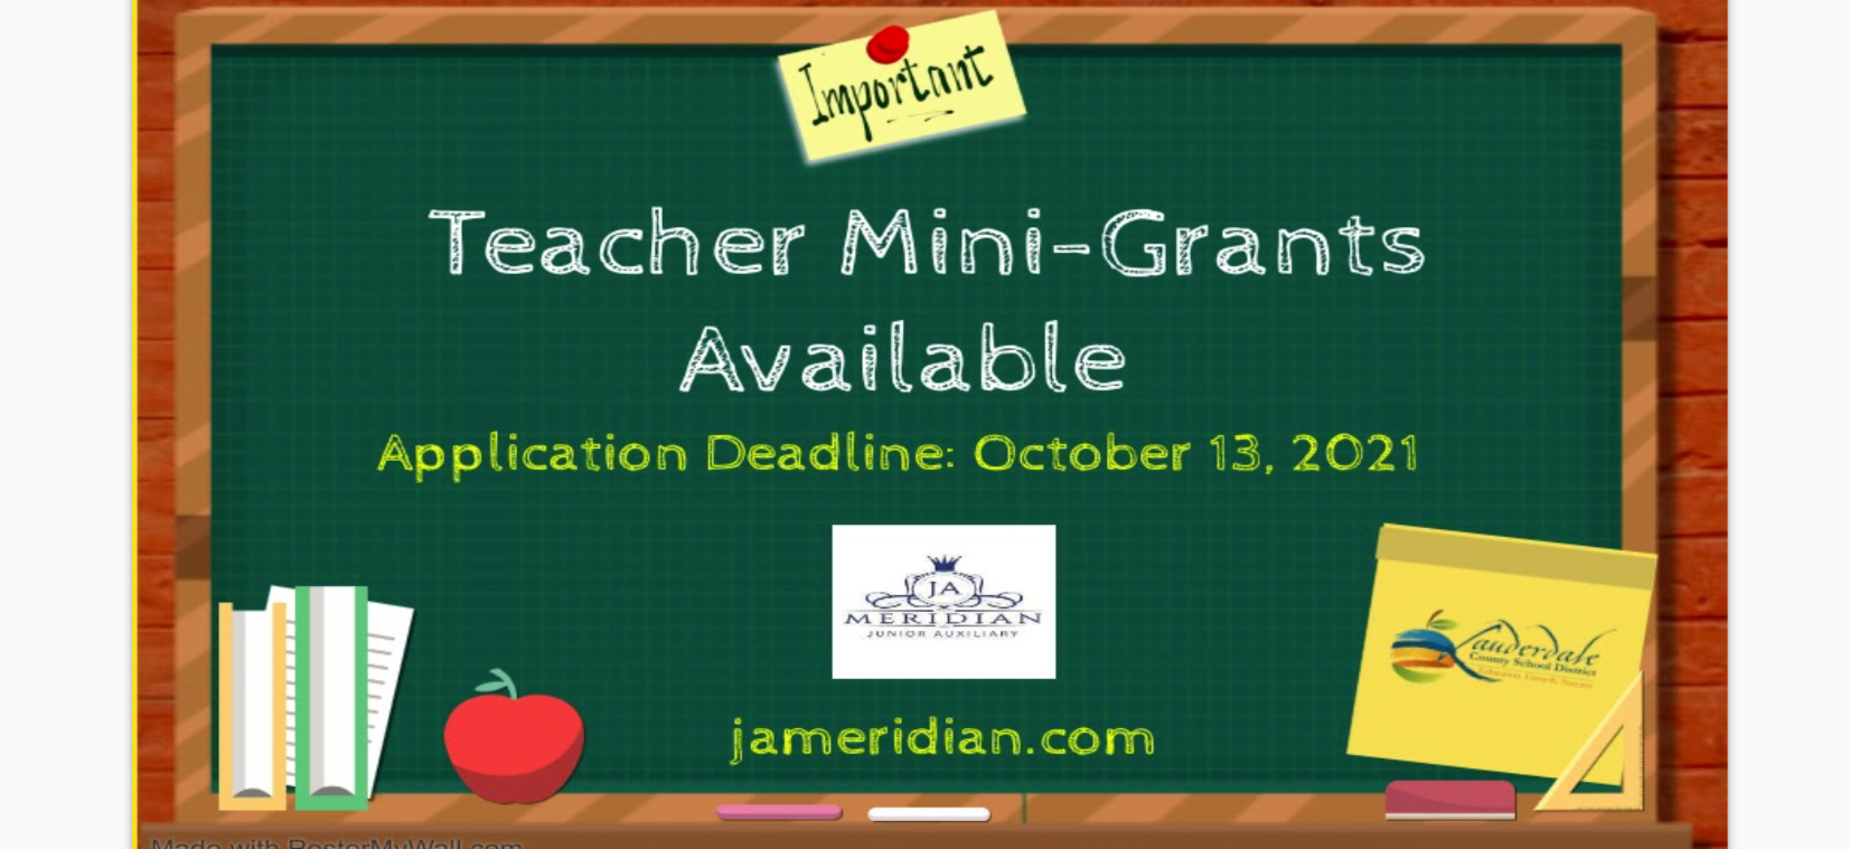 JA Mini Grant Information